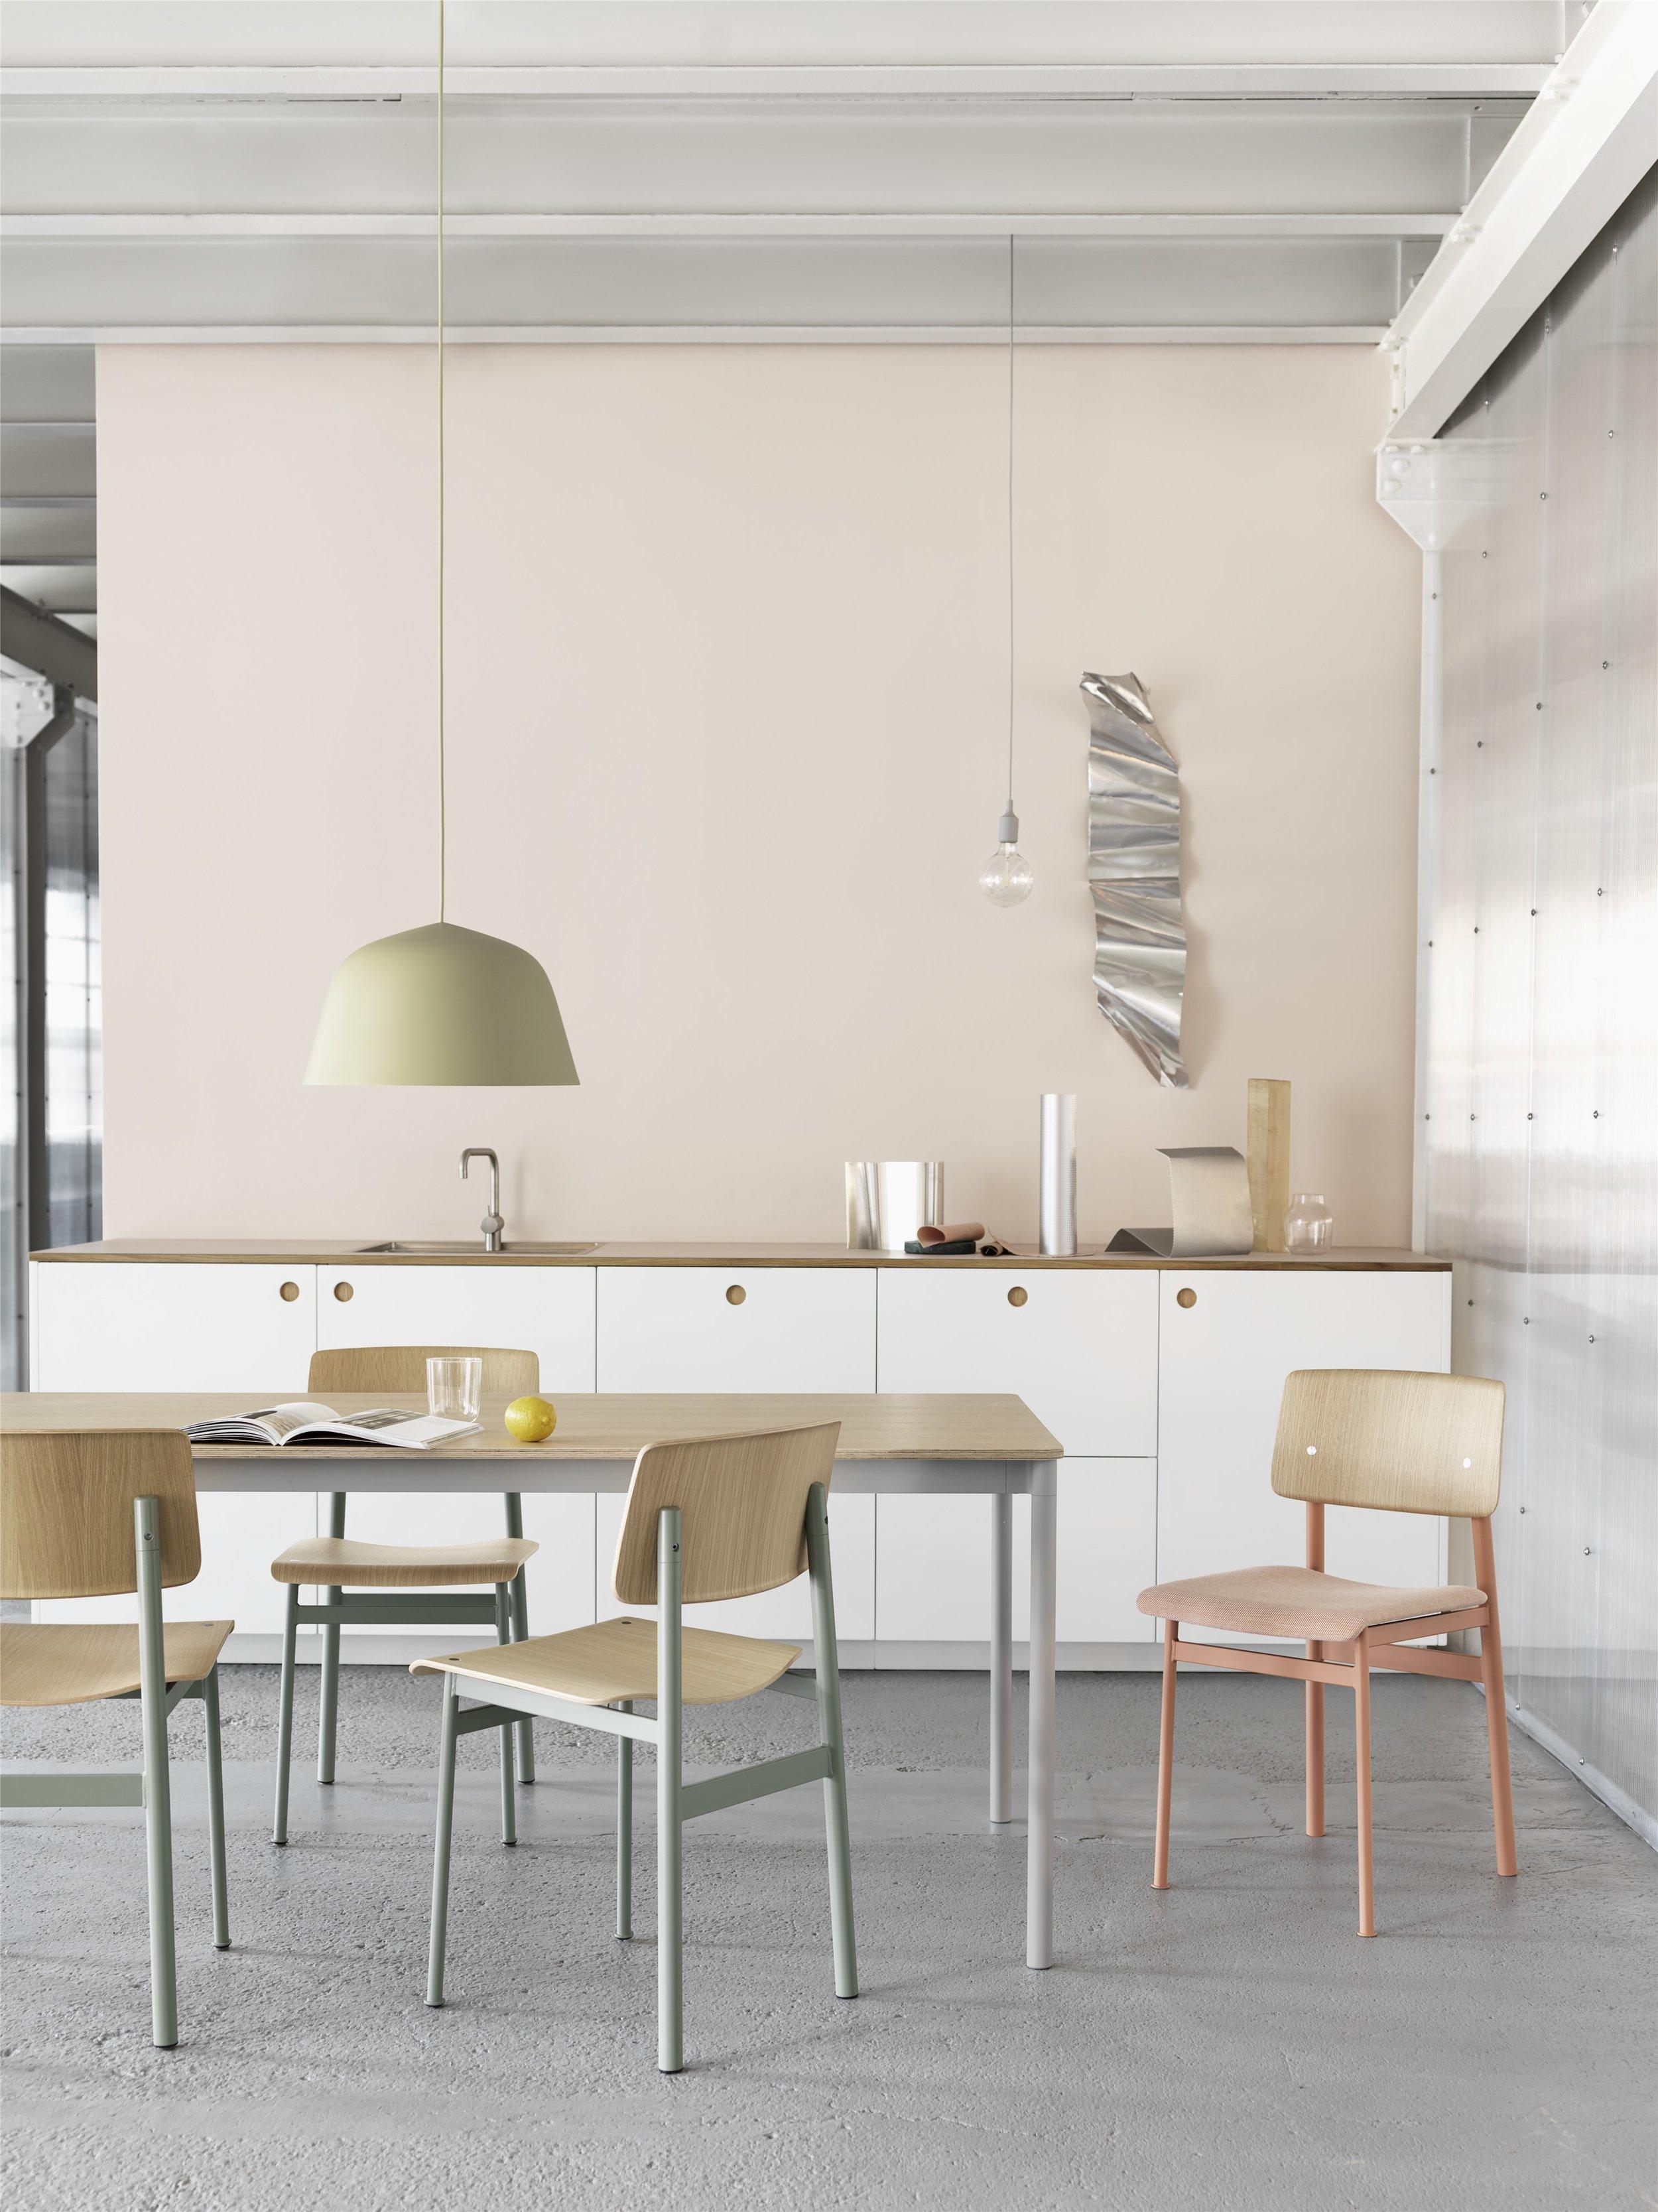 Loft-chair-upholstery-Base-table-oak-grey-Ambit-beige-green-E27-org_(150).jpg